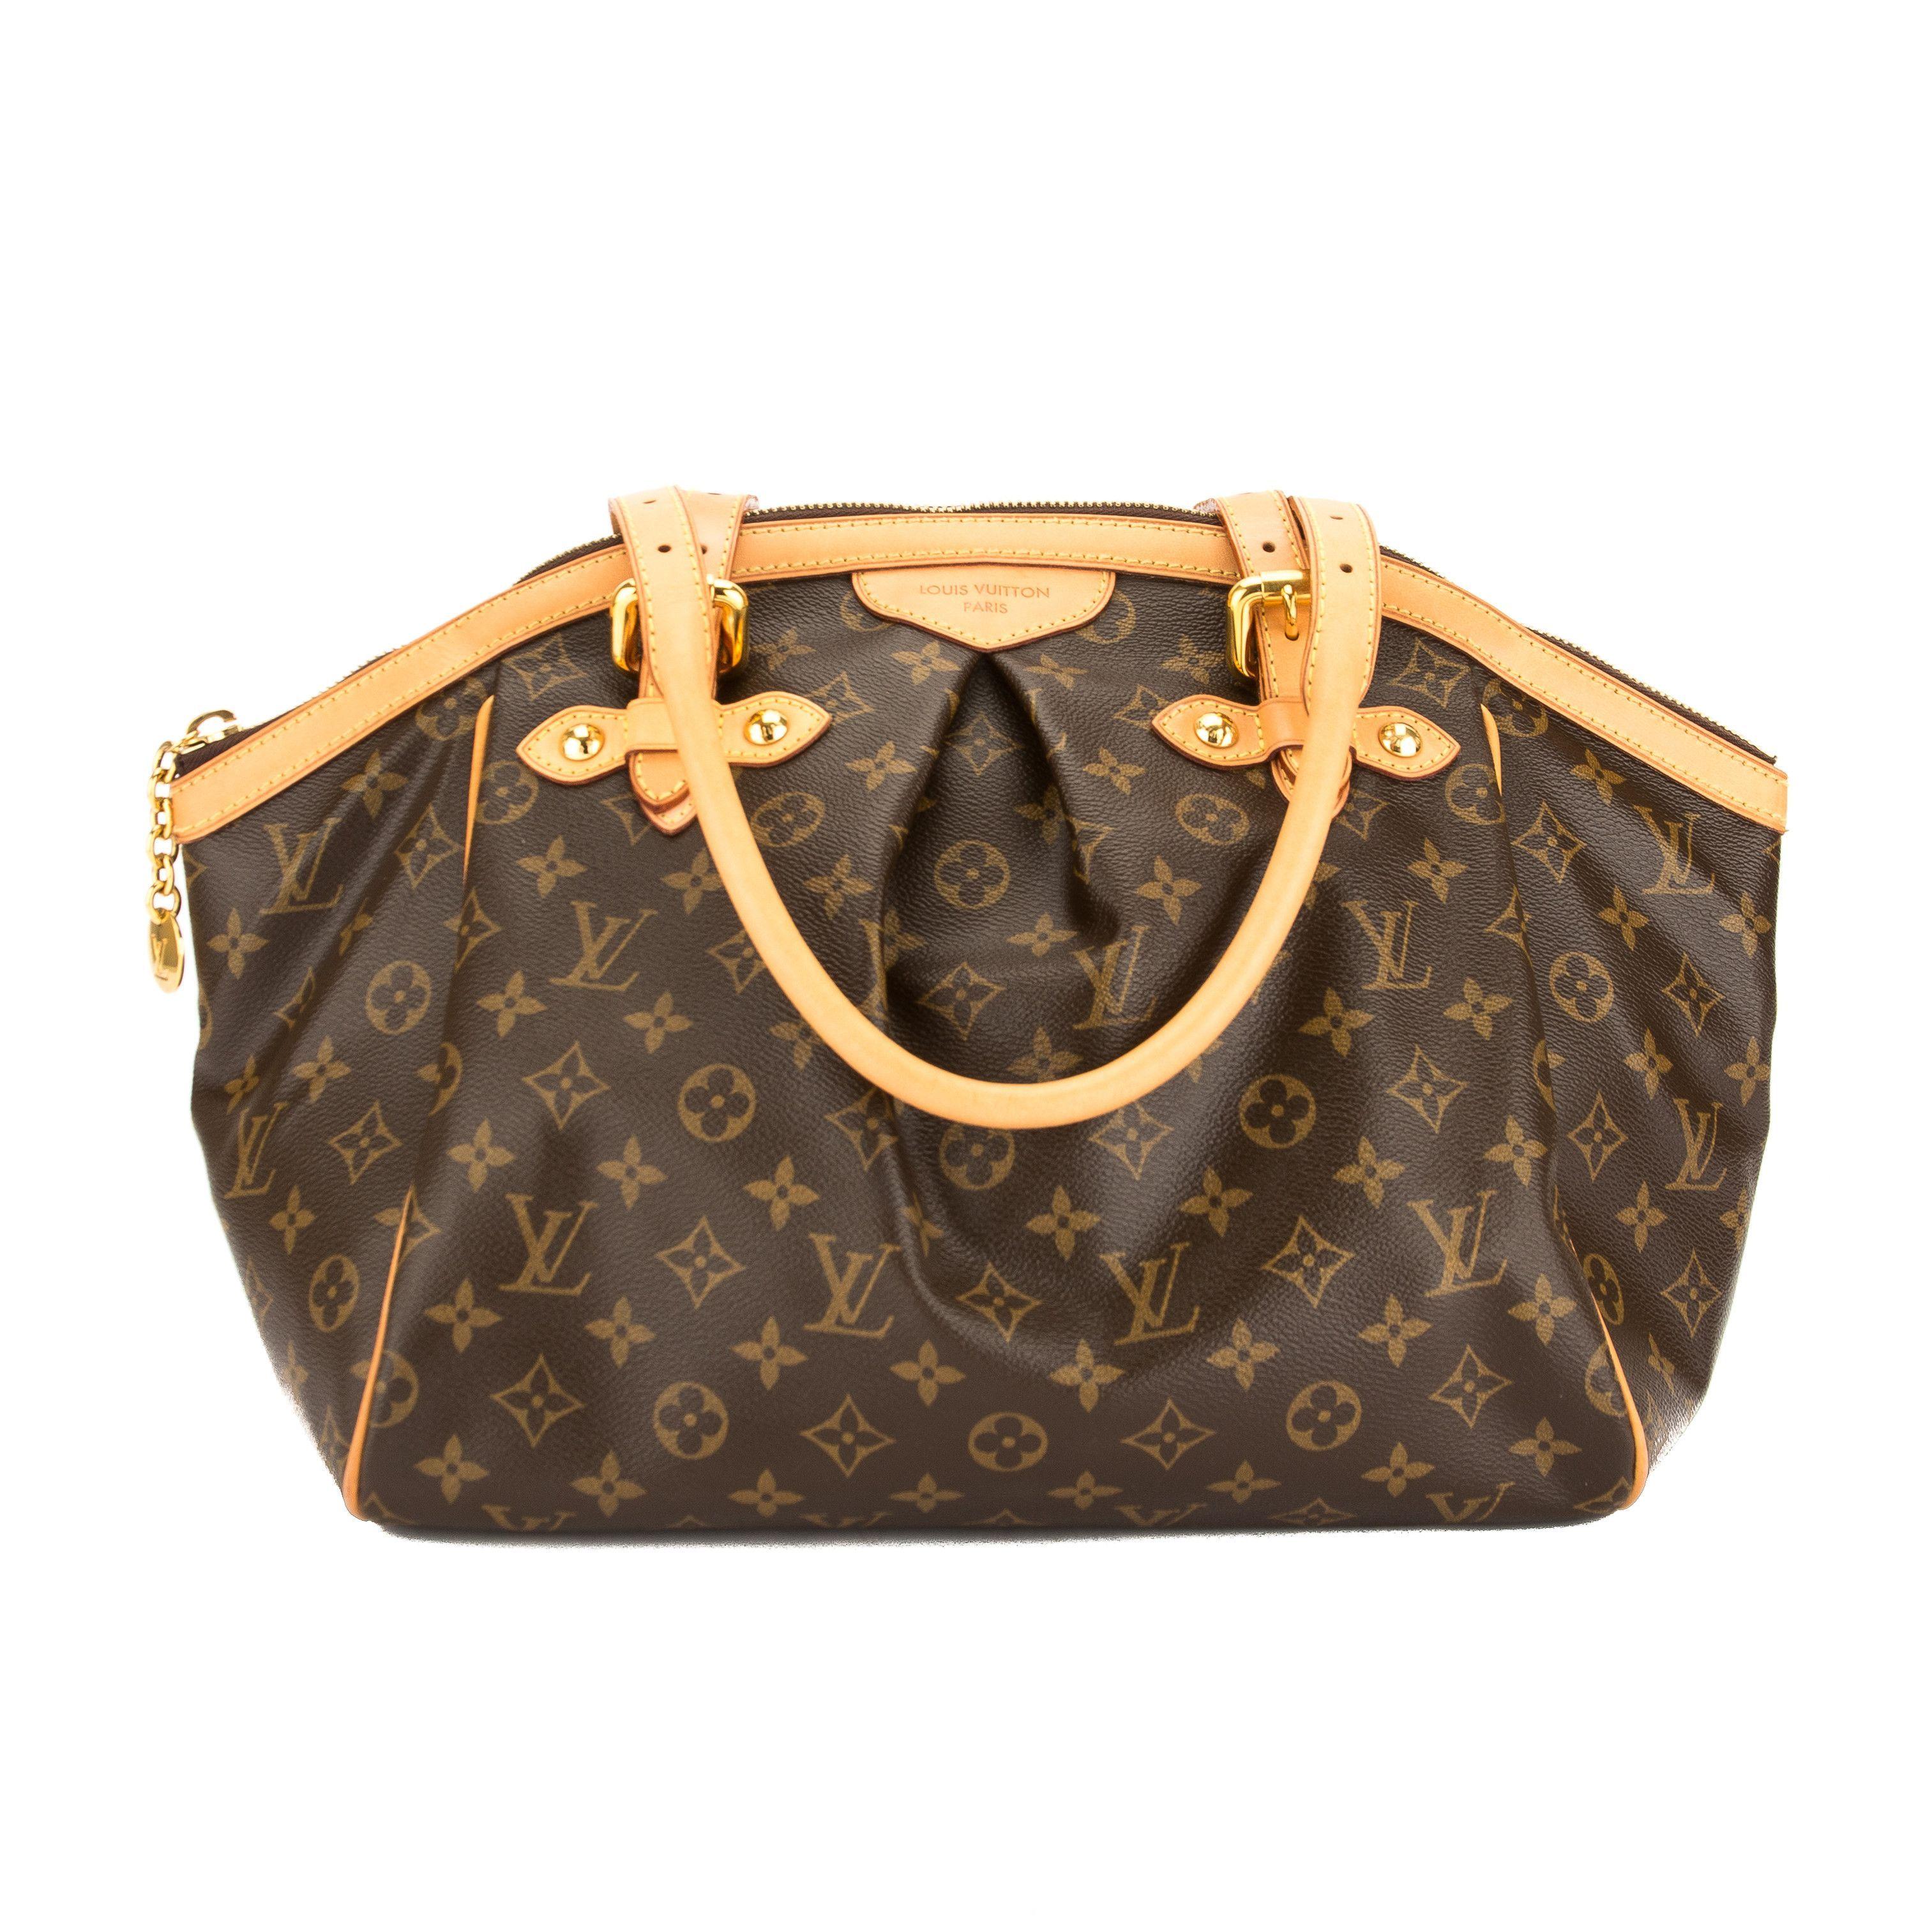 Louis Vuitton Monogram Canvas Tivoli GM Bag (Pre Owned)